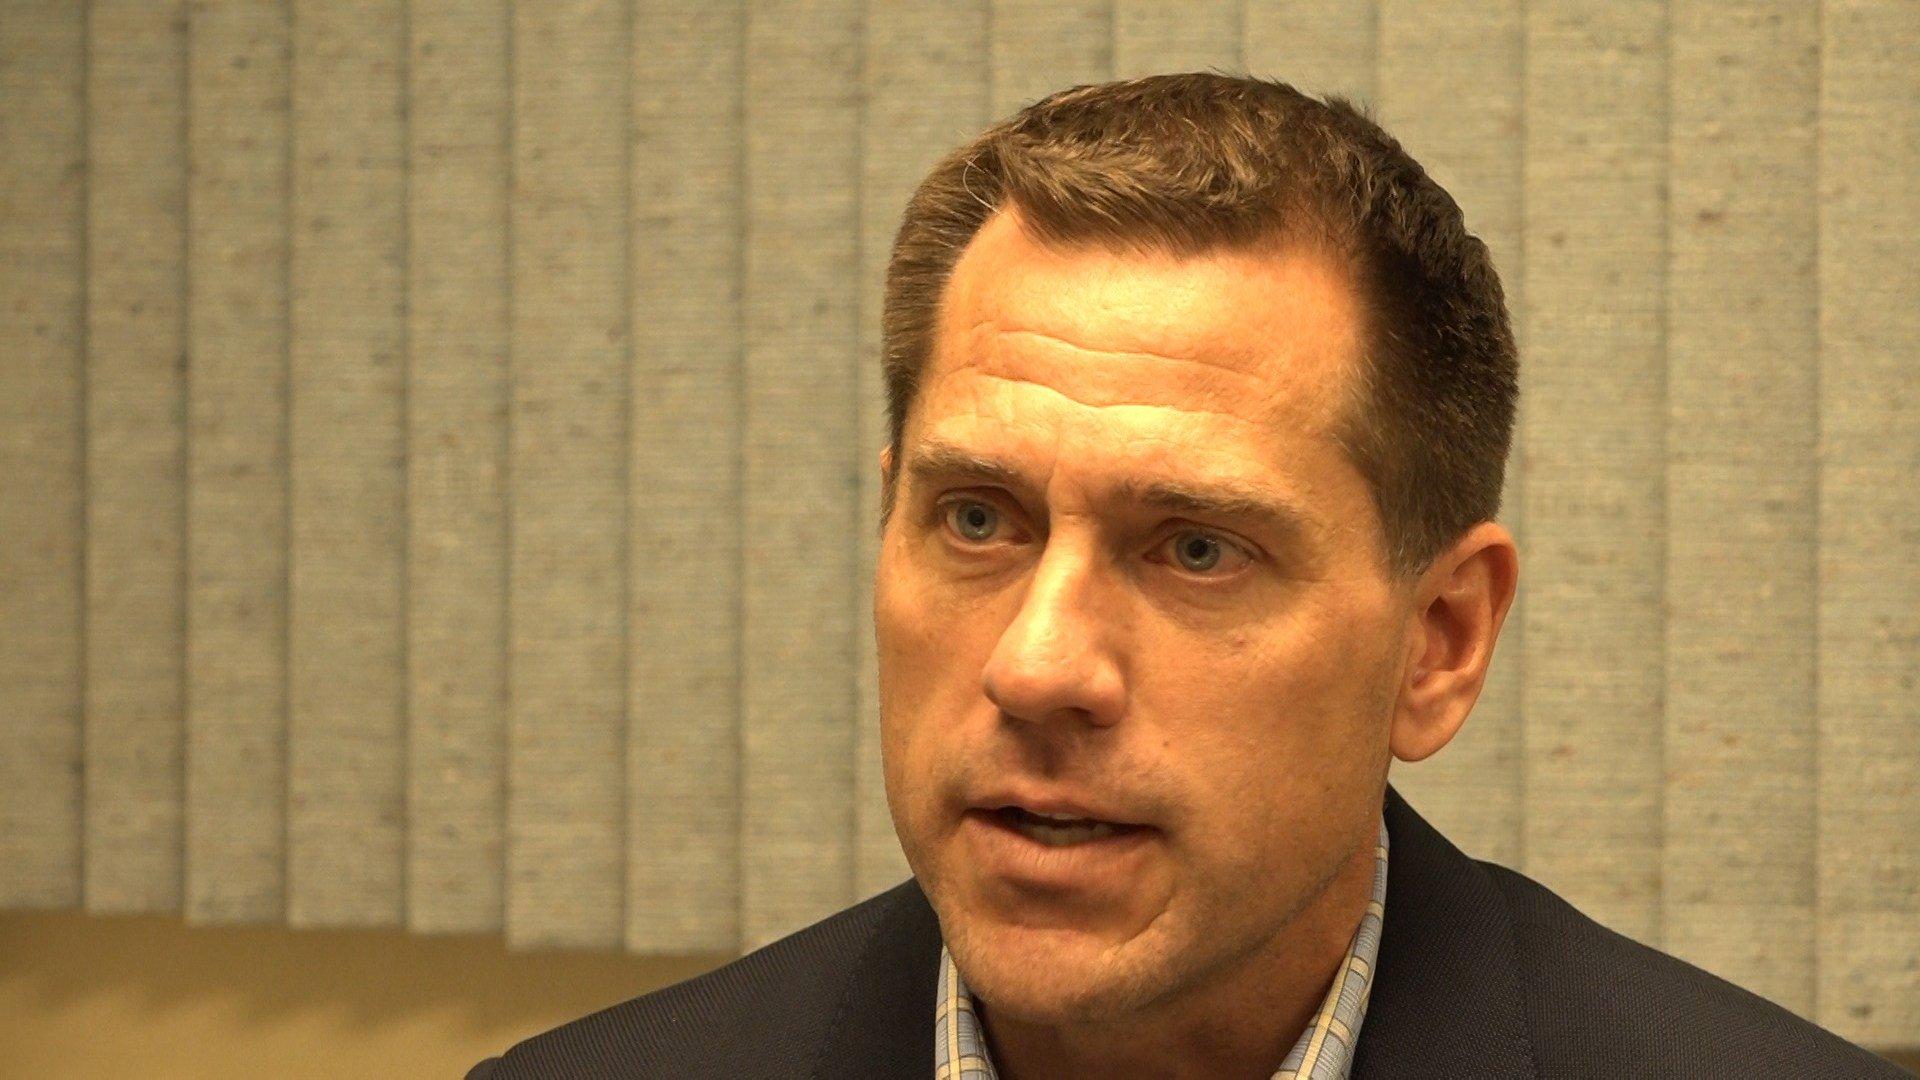 Democratic U.S. House candidate Grant Kier